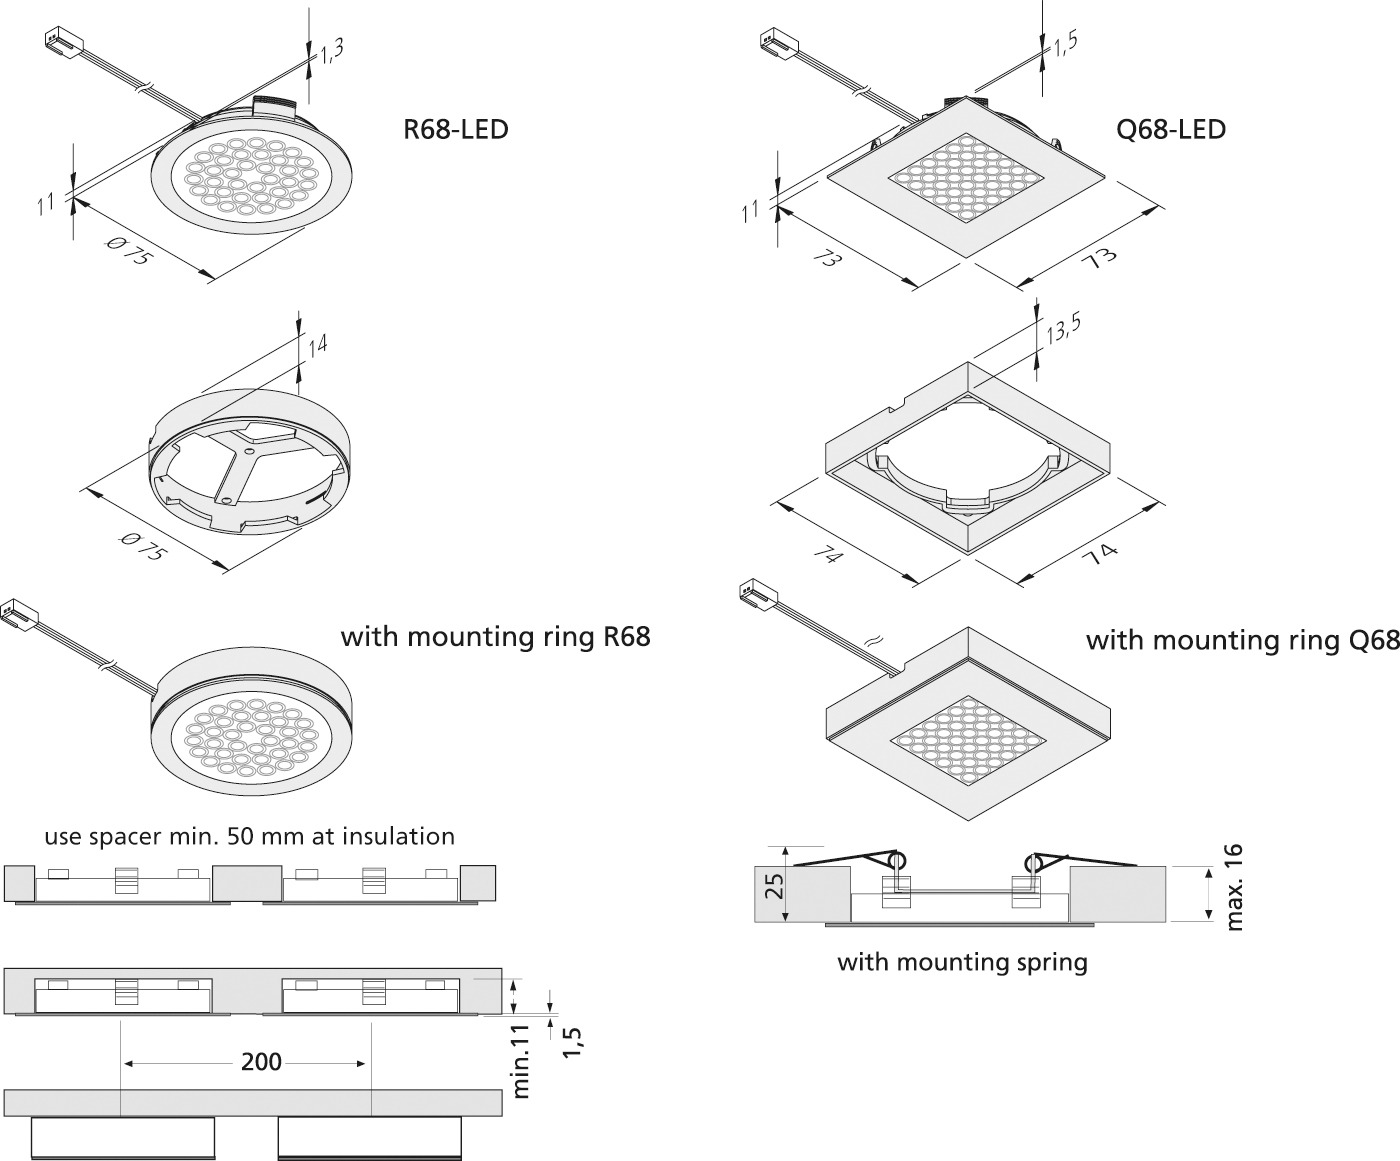 Preview: R68-LED-_-Q68-LED_en